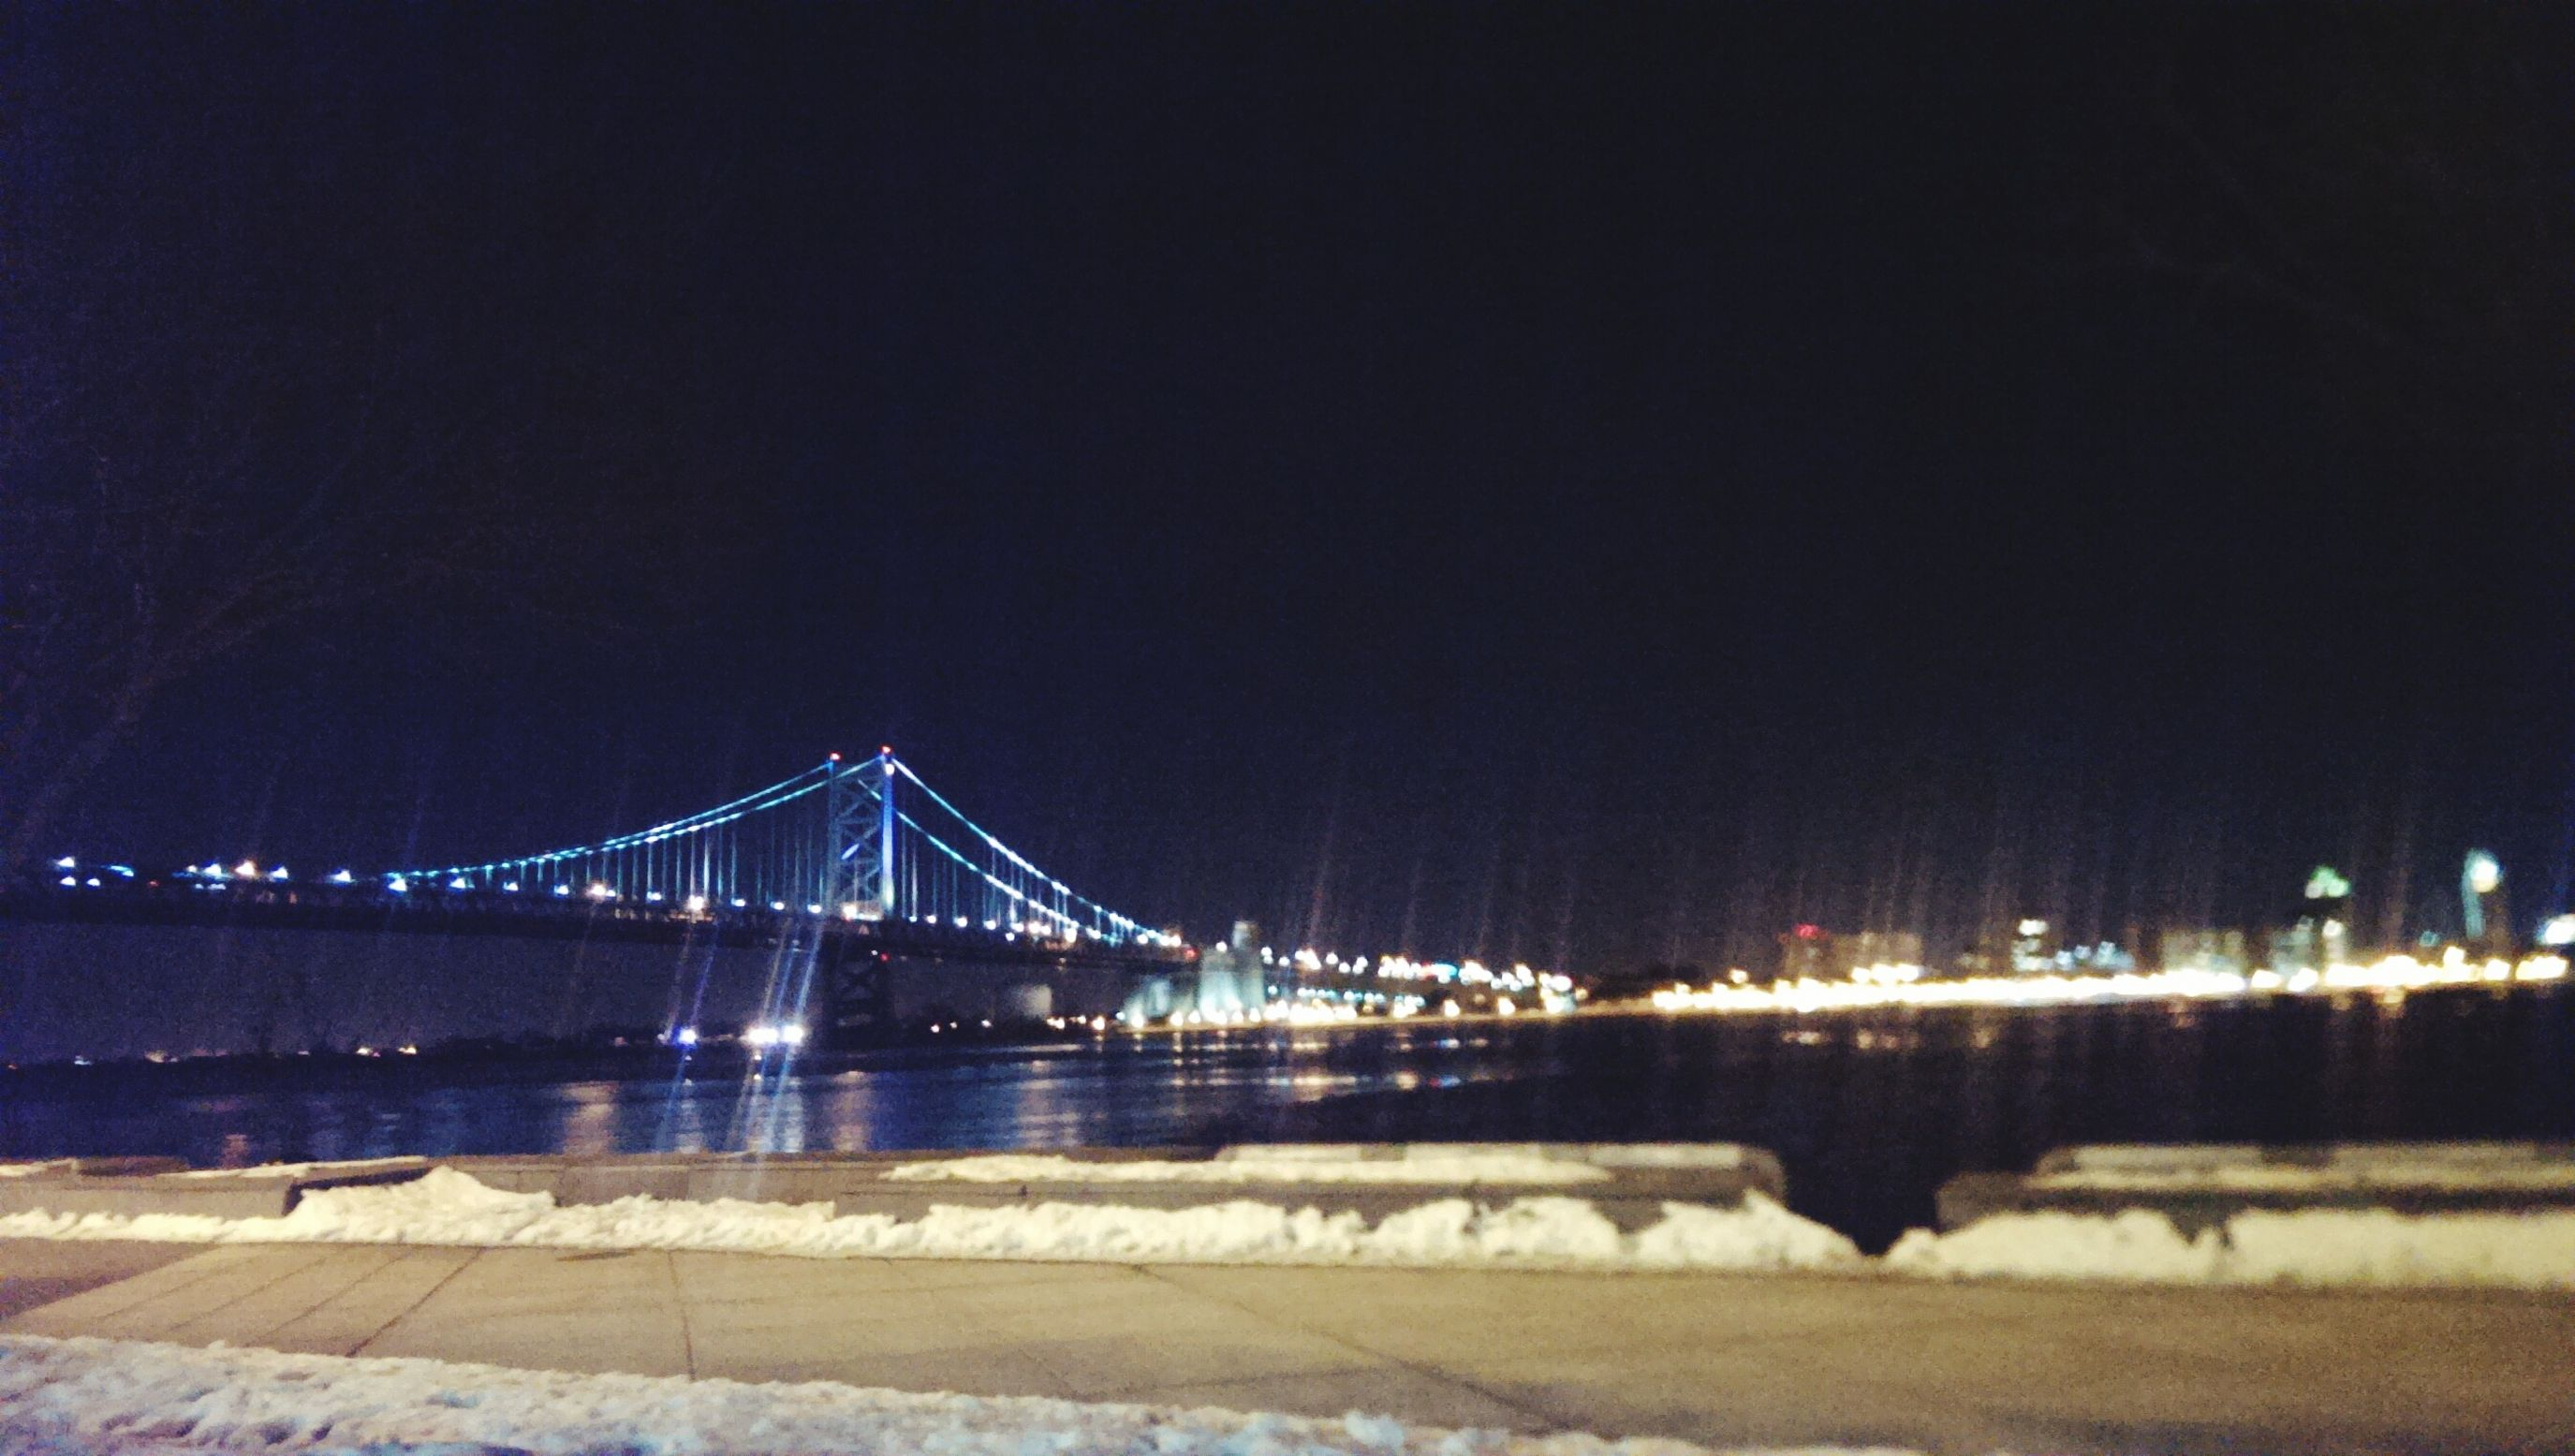 Benfranklinbridge Nightphotography Night Lights Skaiting Colors